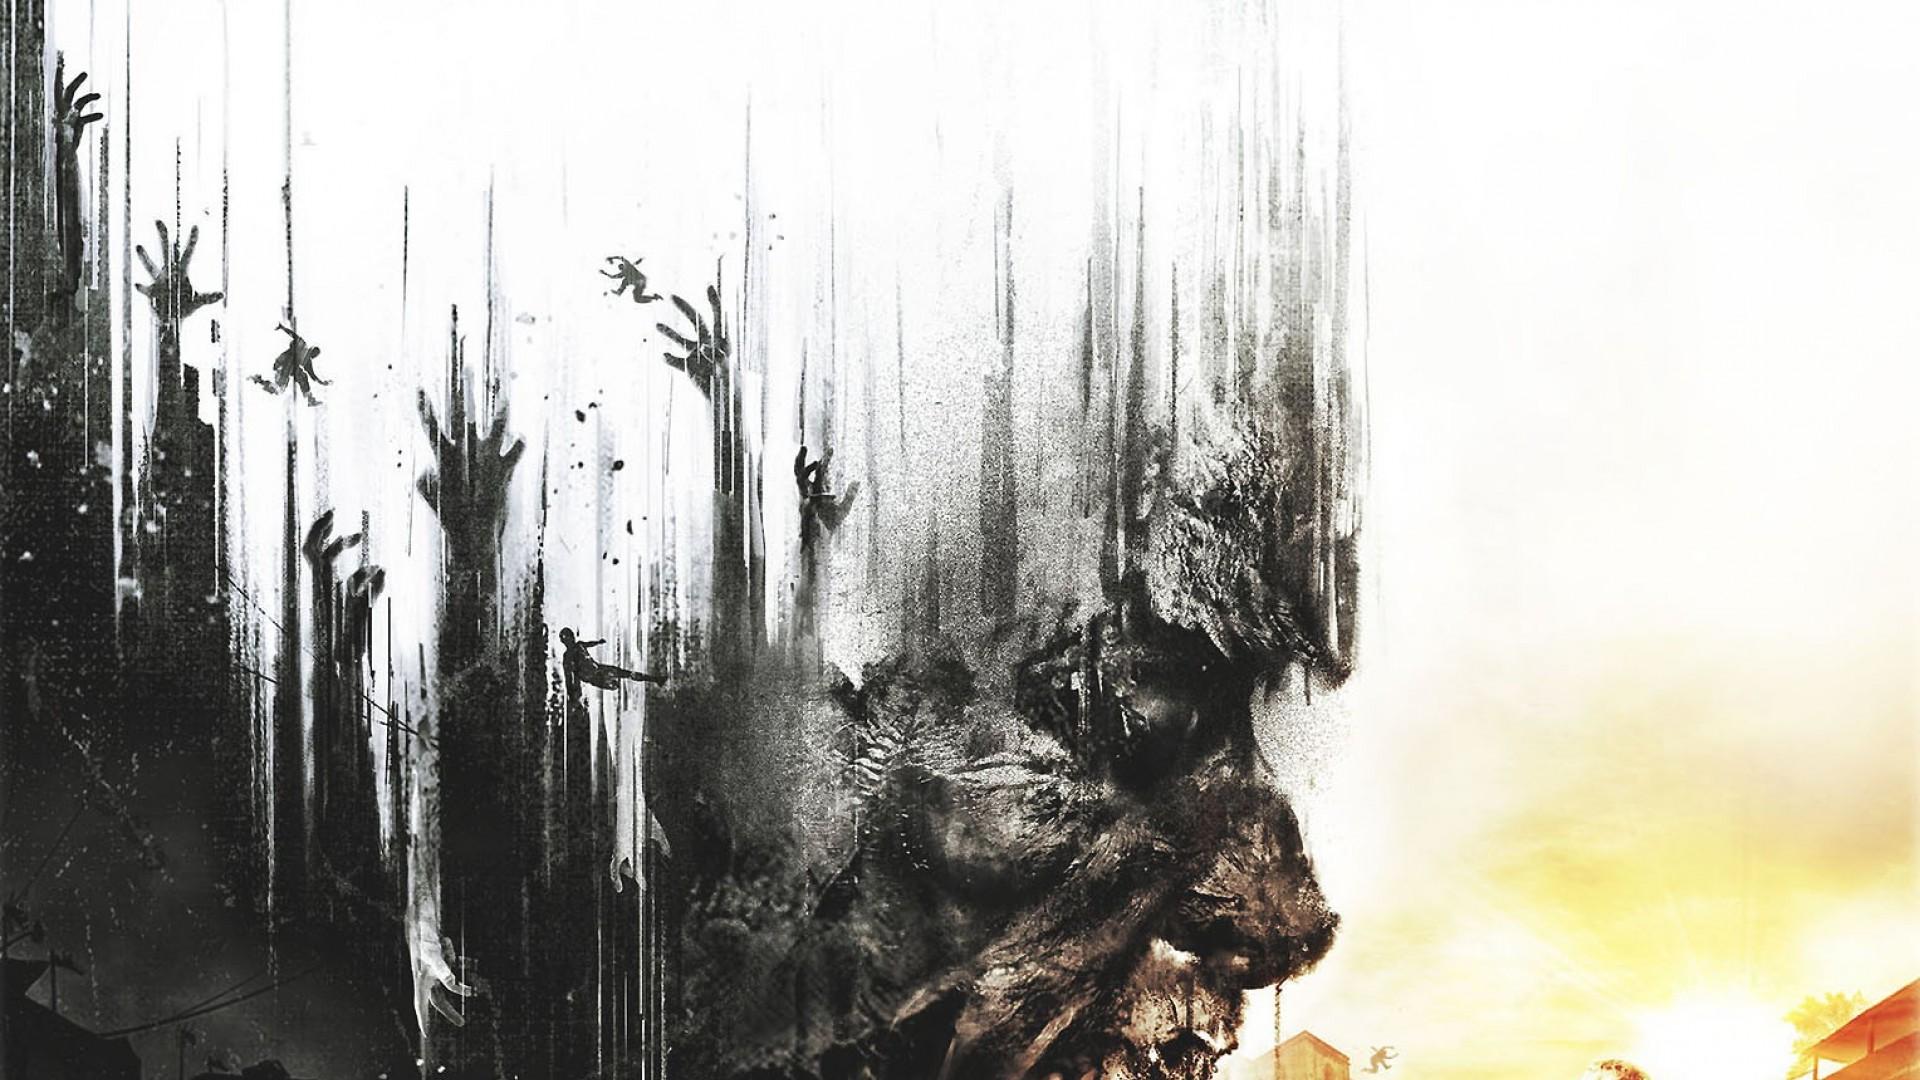 Dying Light dark zombie f wallpaper 1920x1080 166917 WallpaperUP 1920x1080